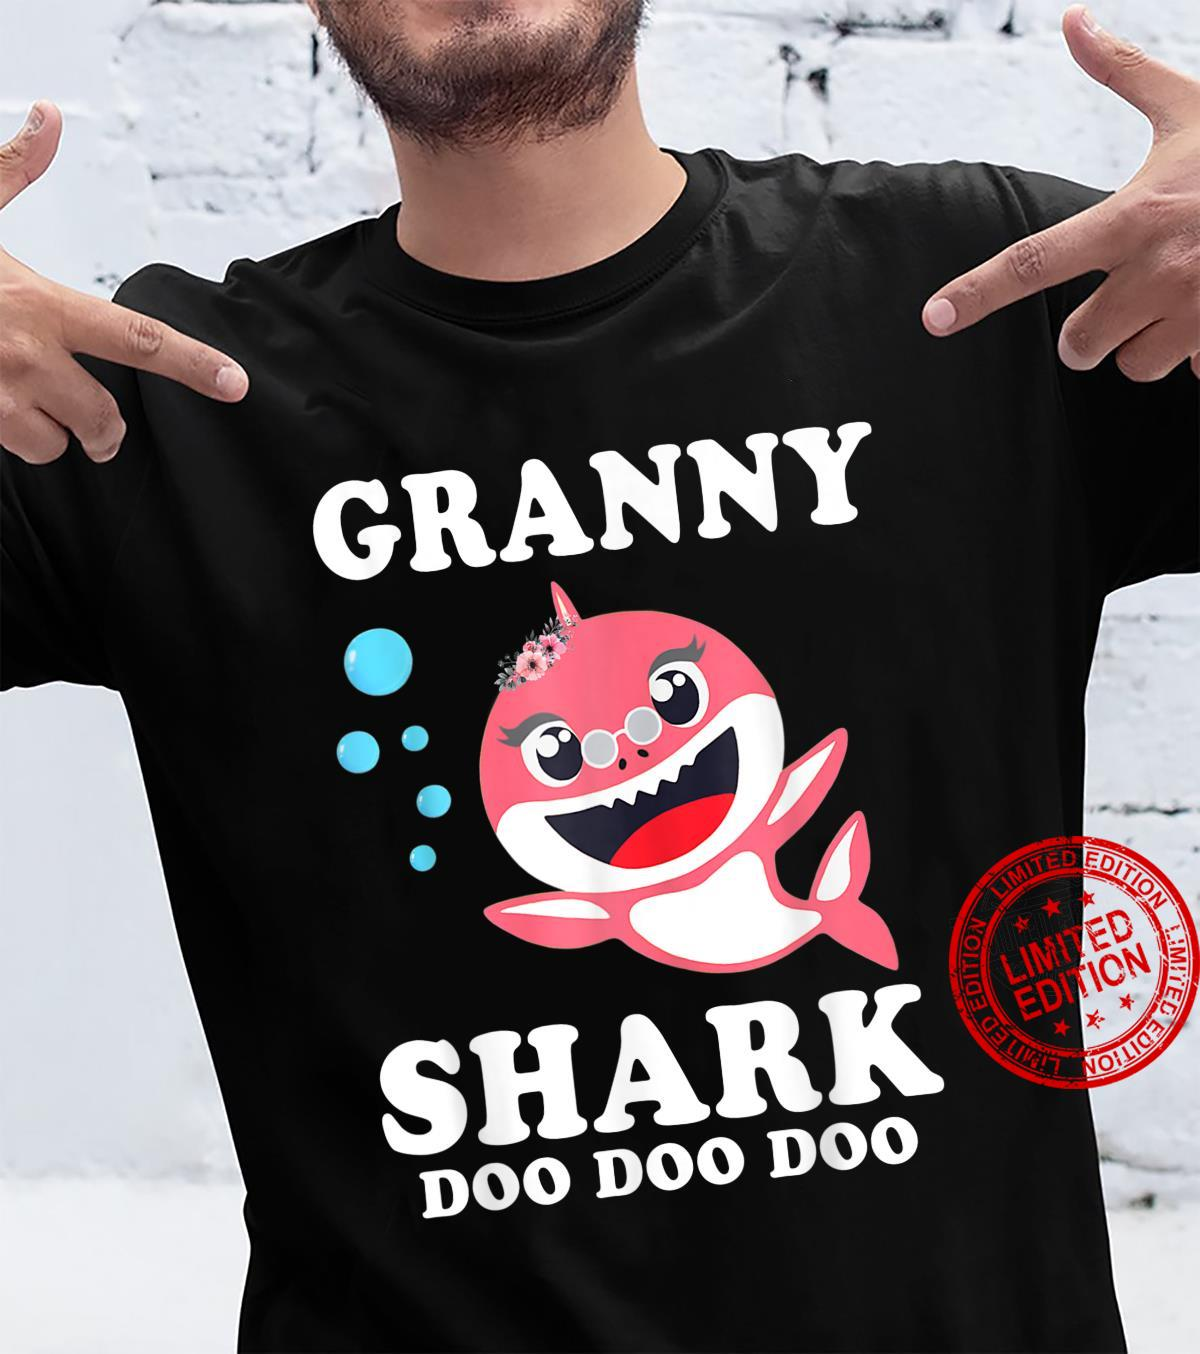 Granny Shark Shirt, Mother's Day Shirt